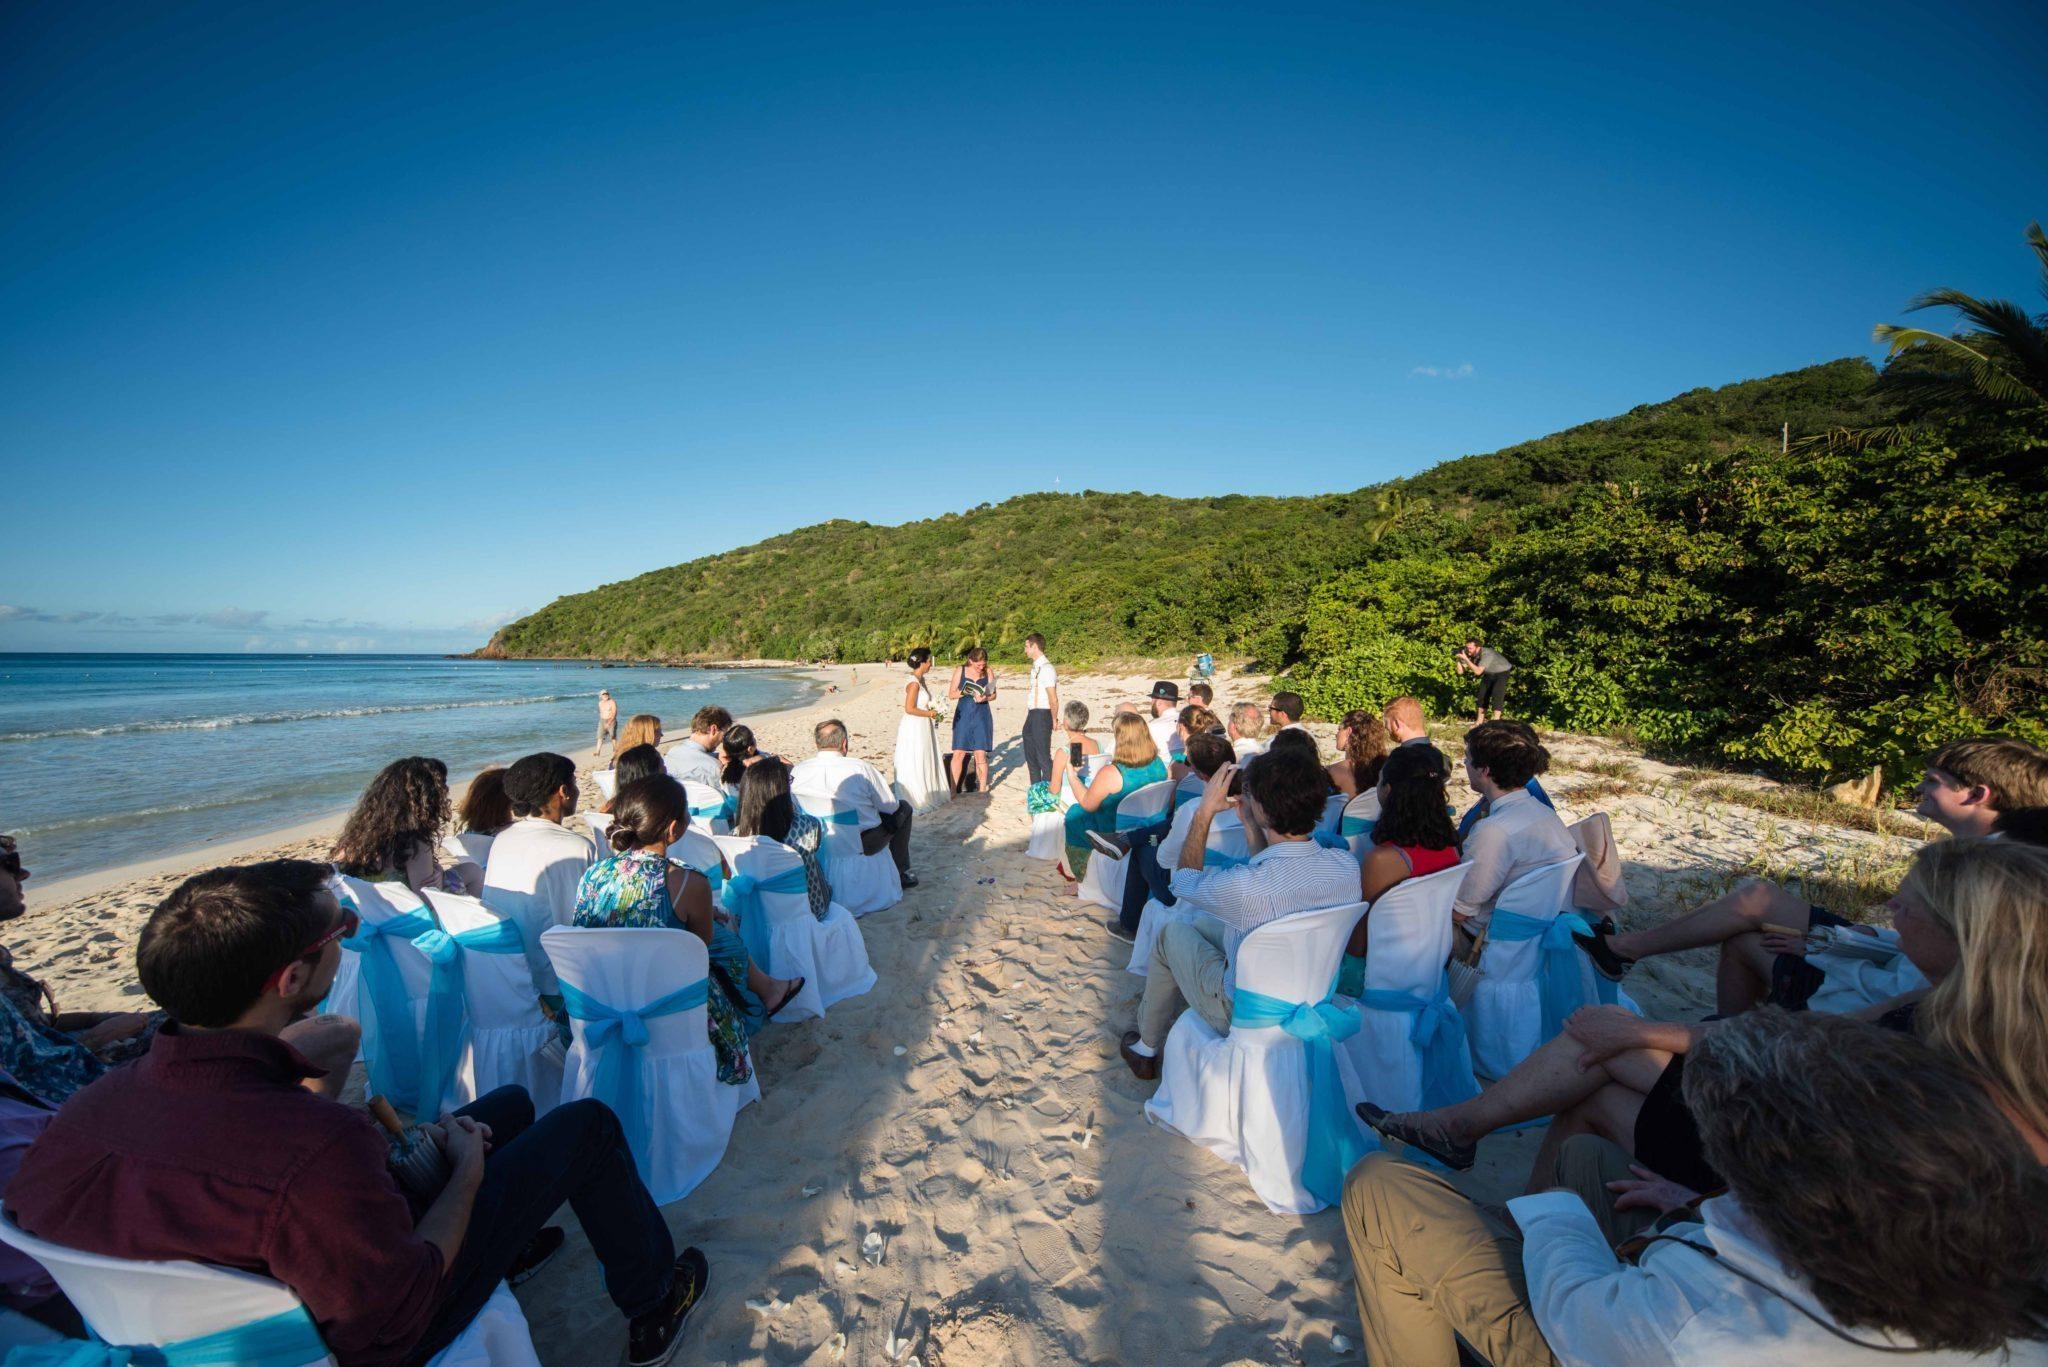 John Sheetal Culebra Wedding Photography036 Puerto Rico Photography037